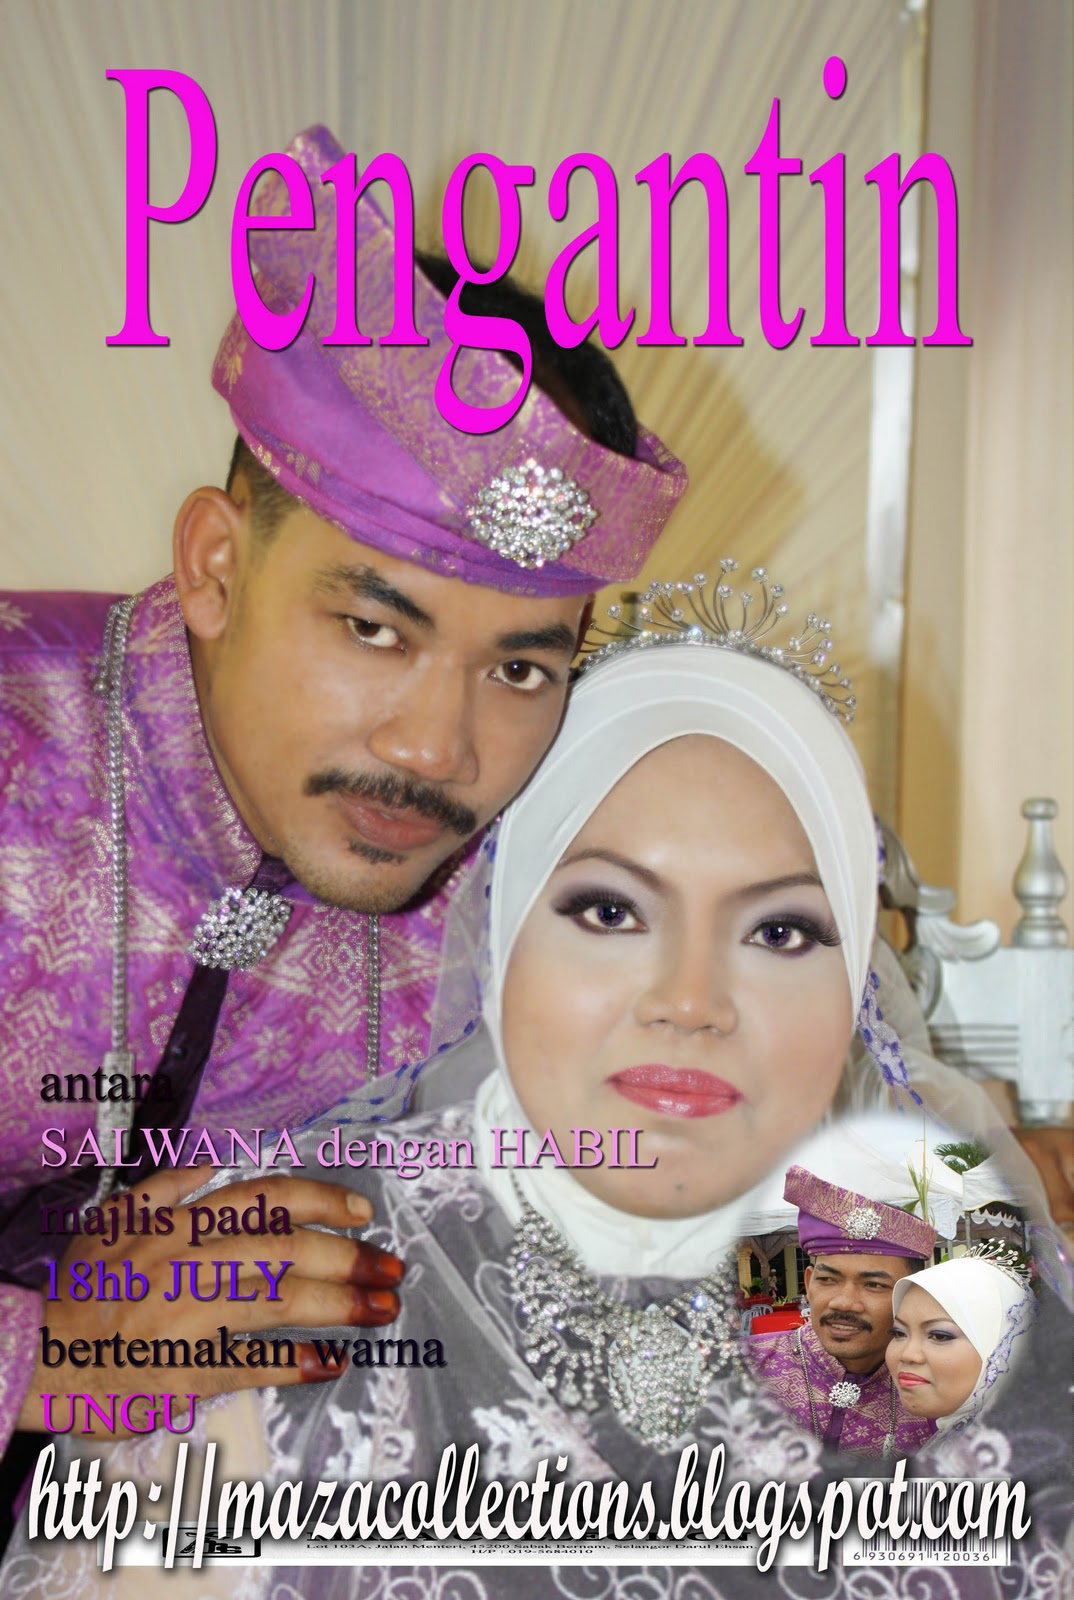 Labels: kulit majalah , magazine cover